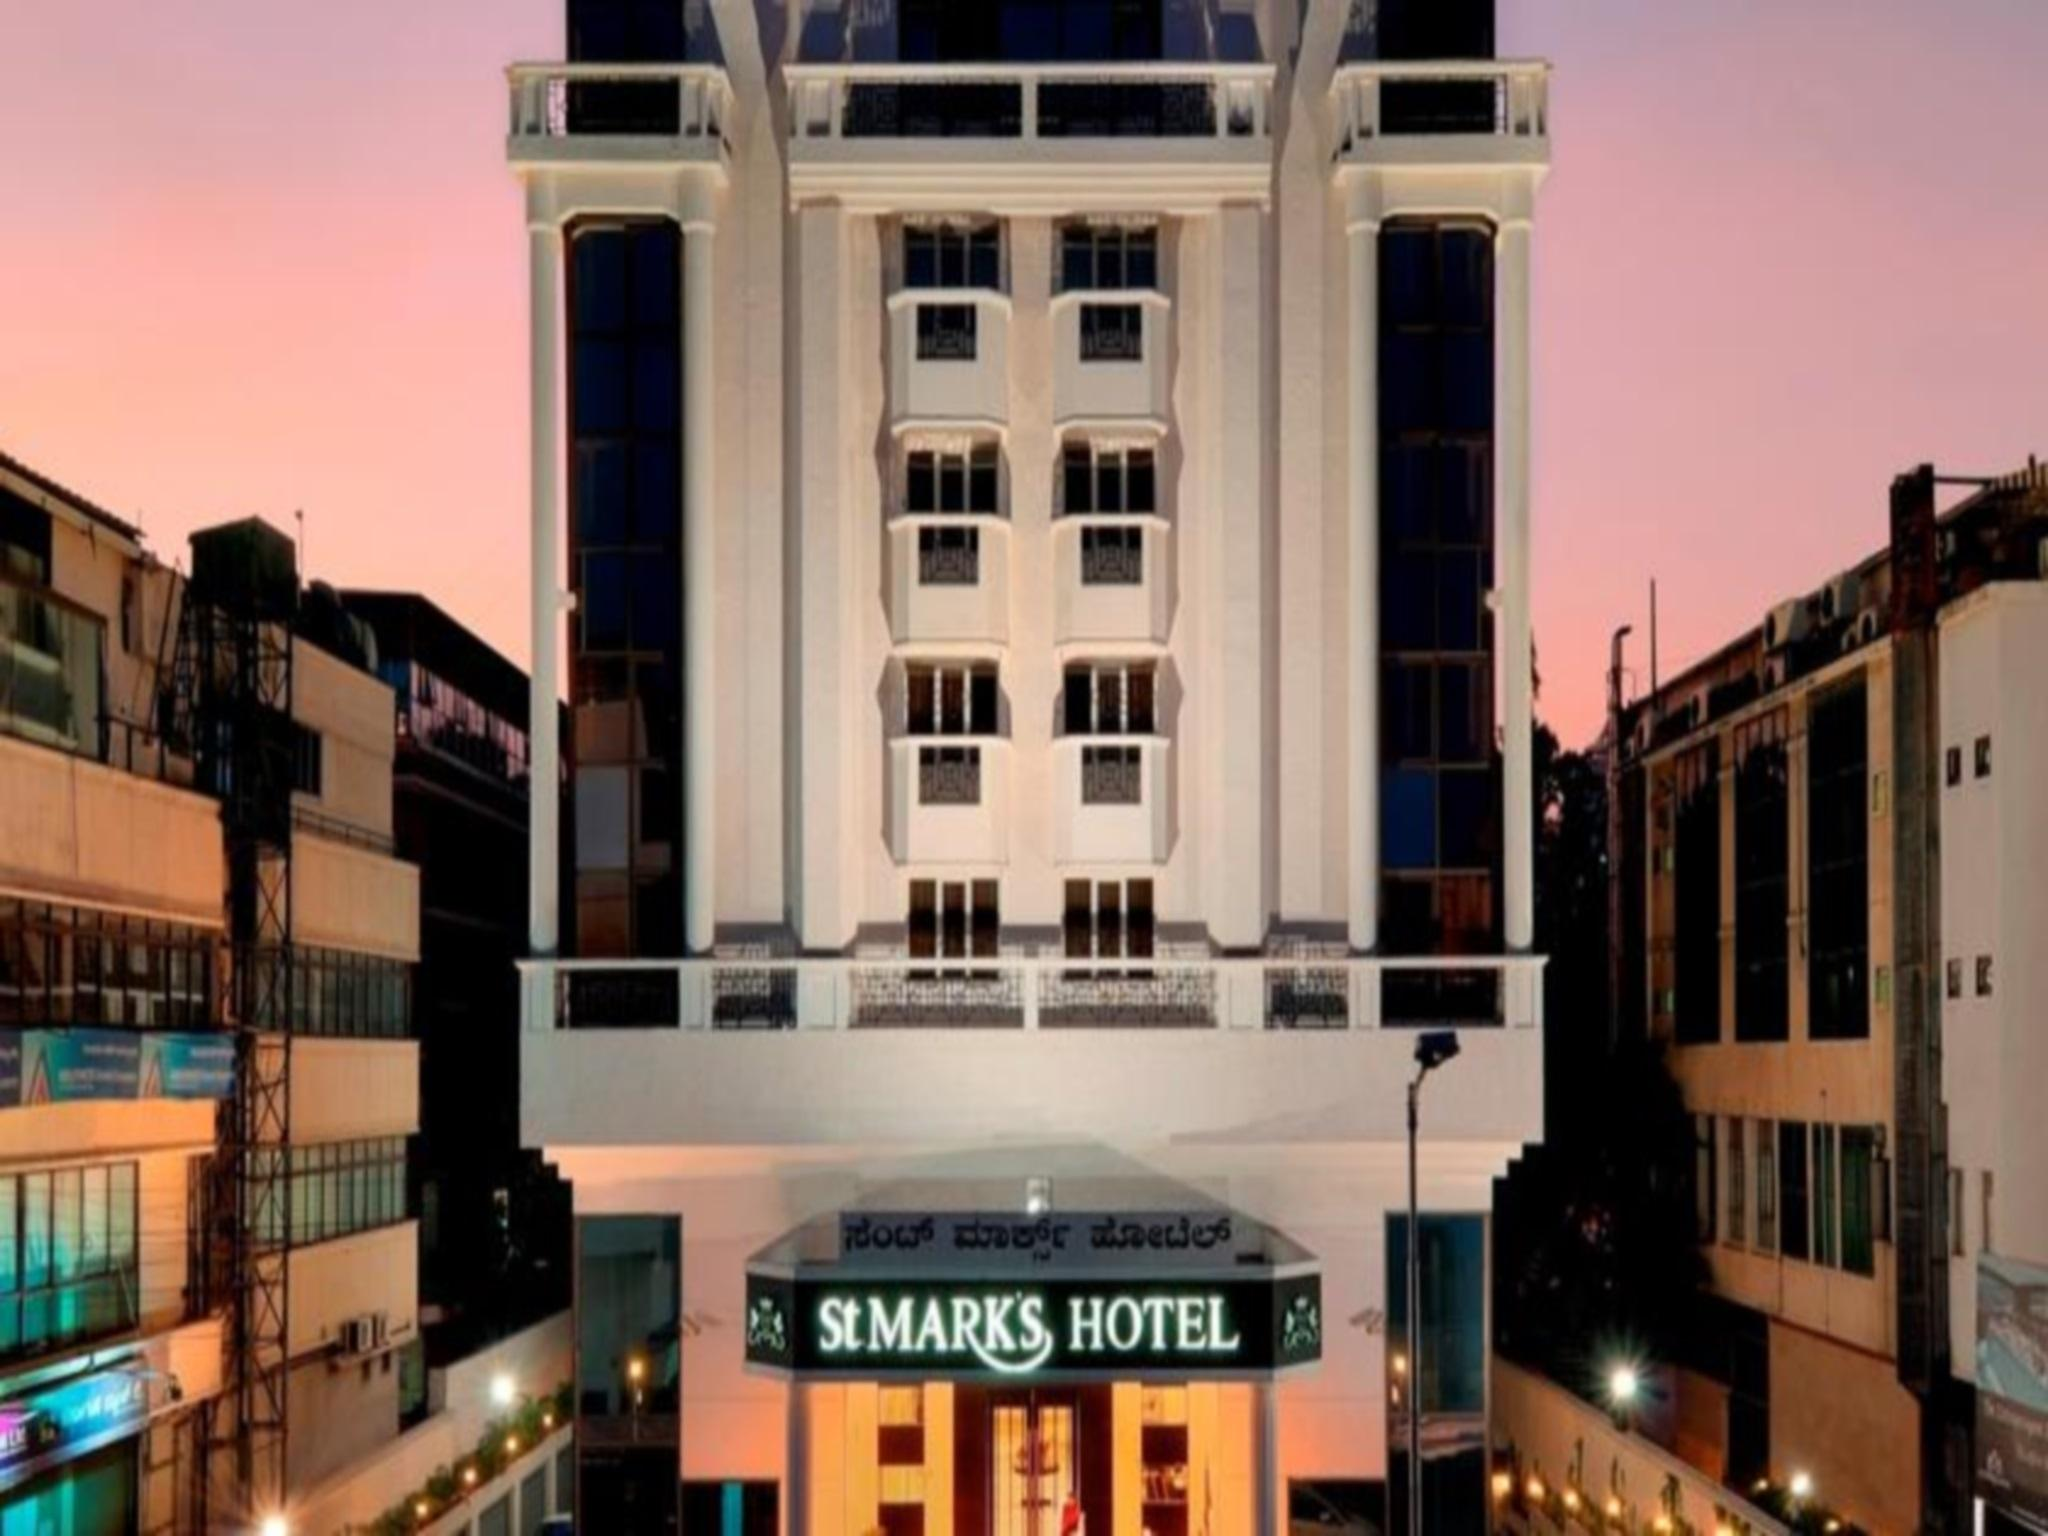 St. Mark's Hotel